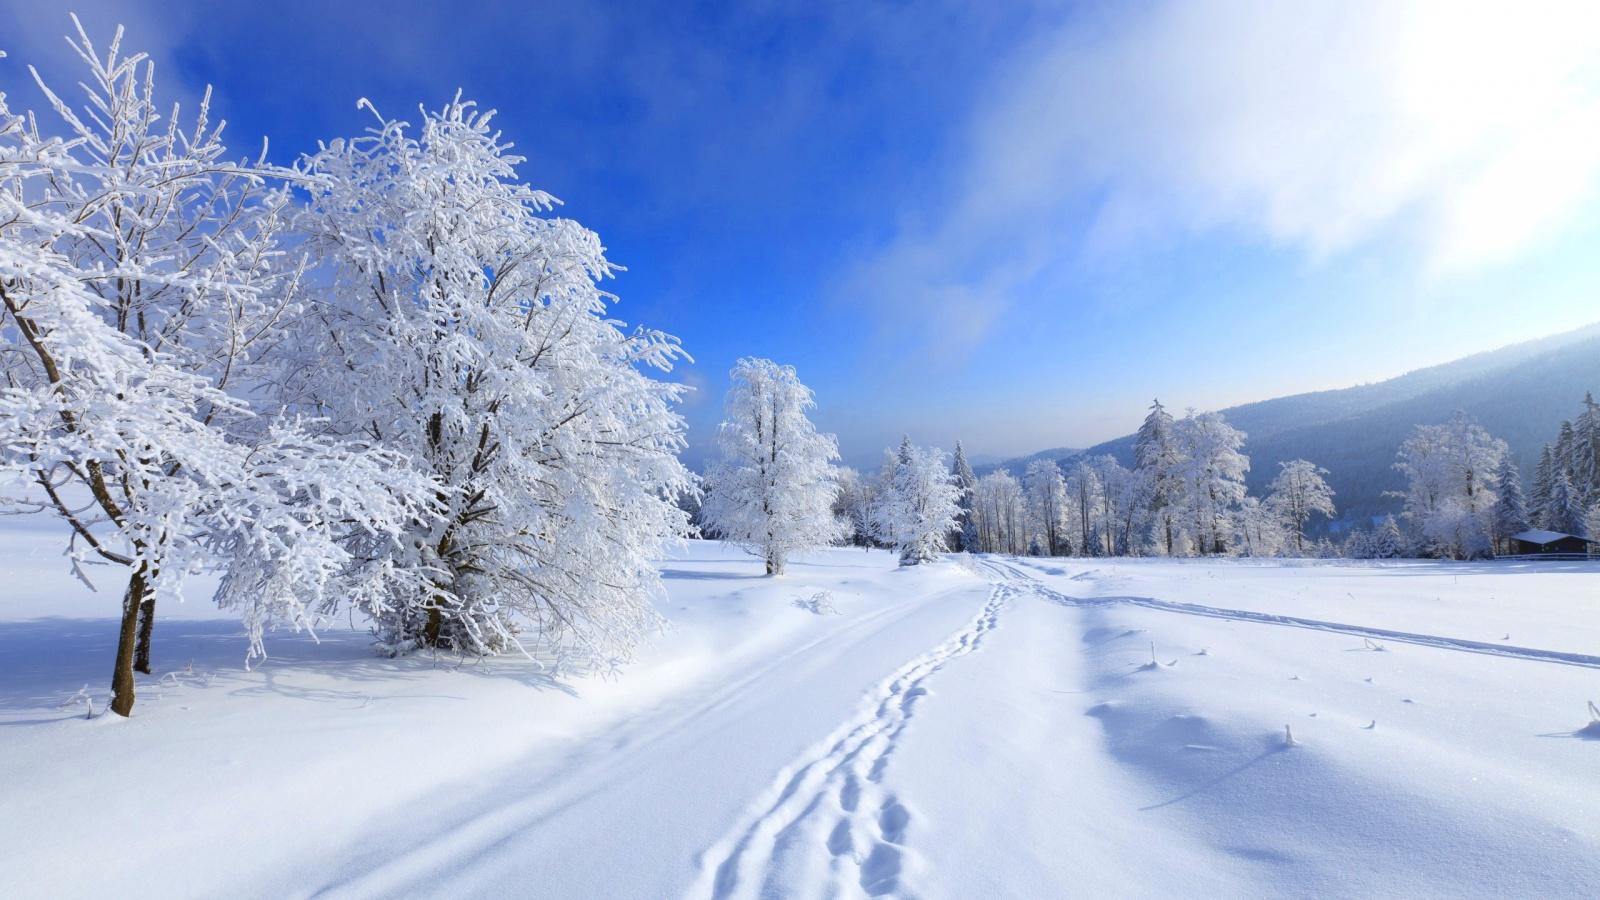 Free Winter Nature Wallpaper, Free Winter Pc Wallpaper